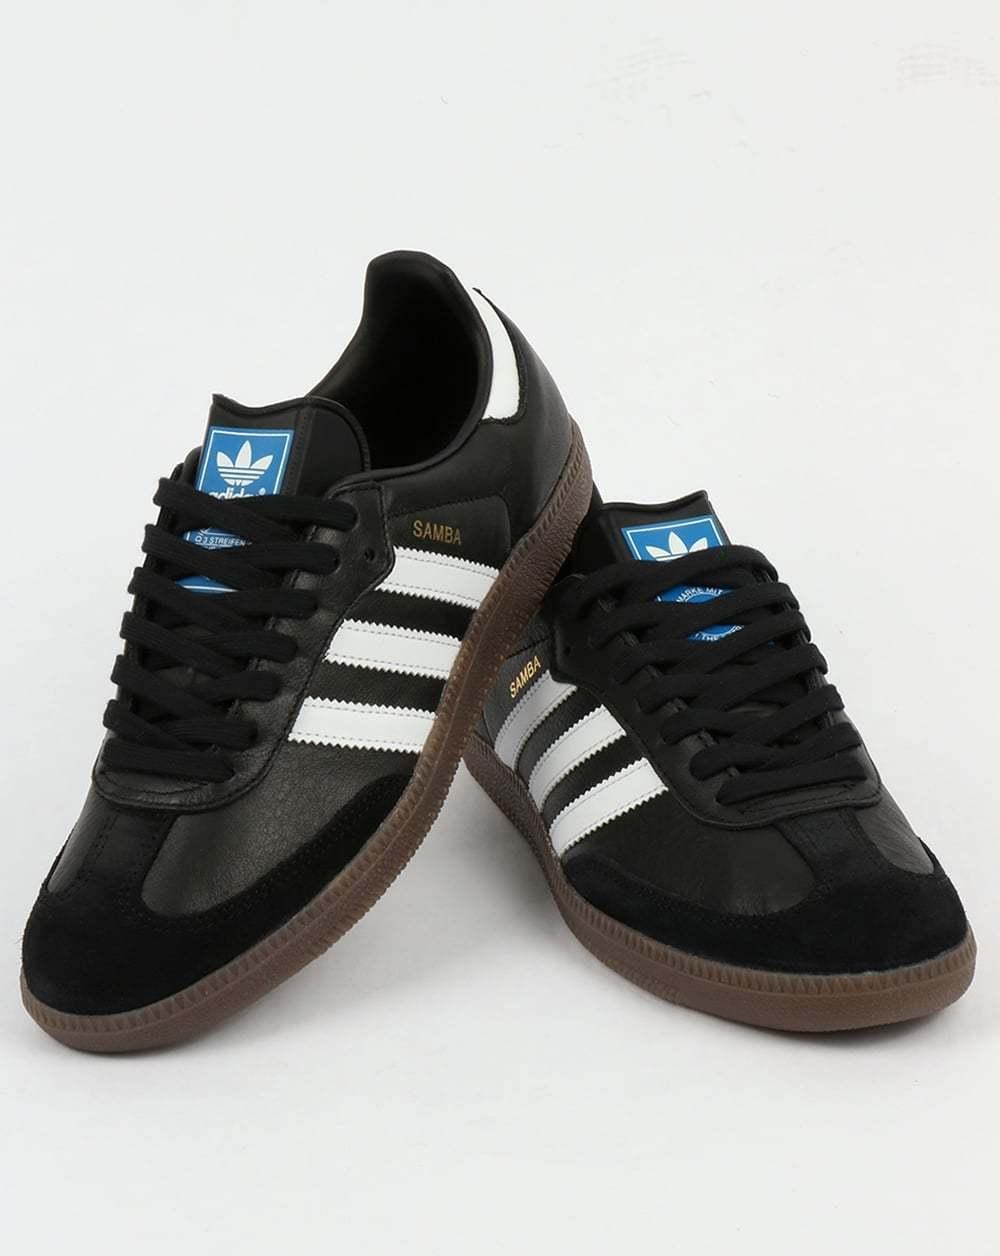 adidas Samba OG Trainers in Black